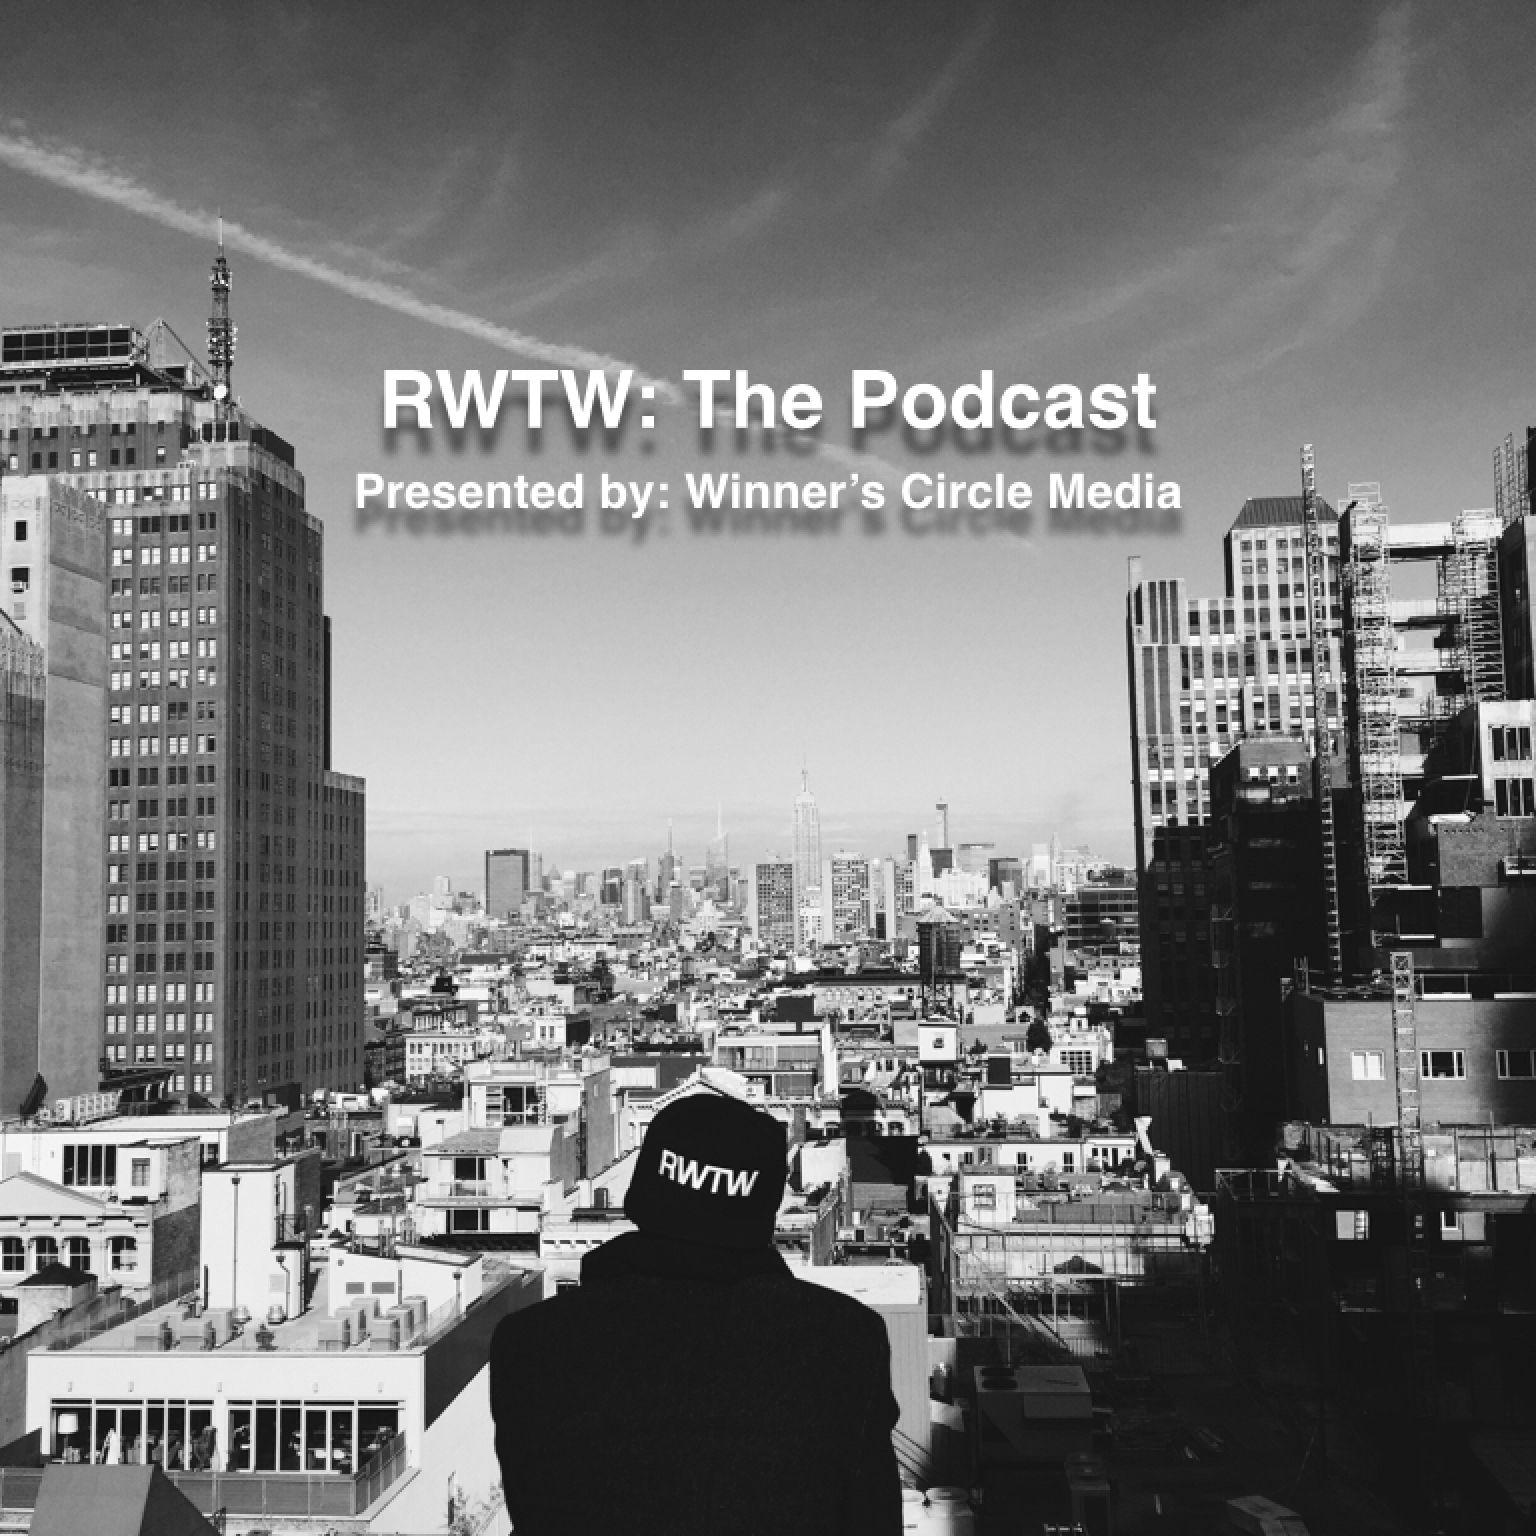 RWTW: The Podcast